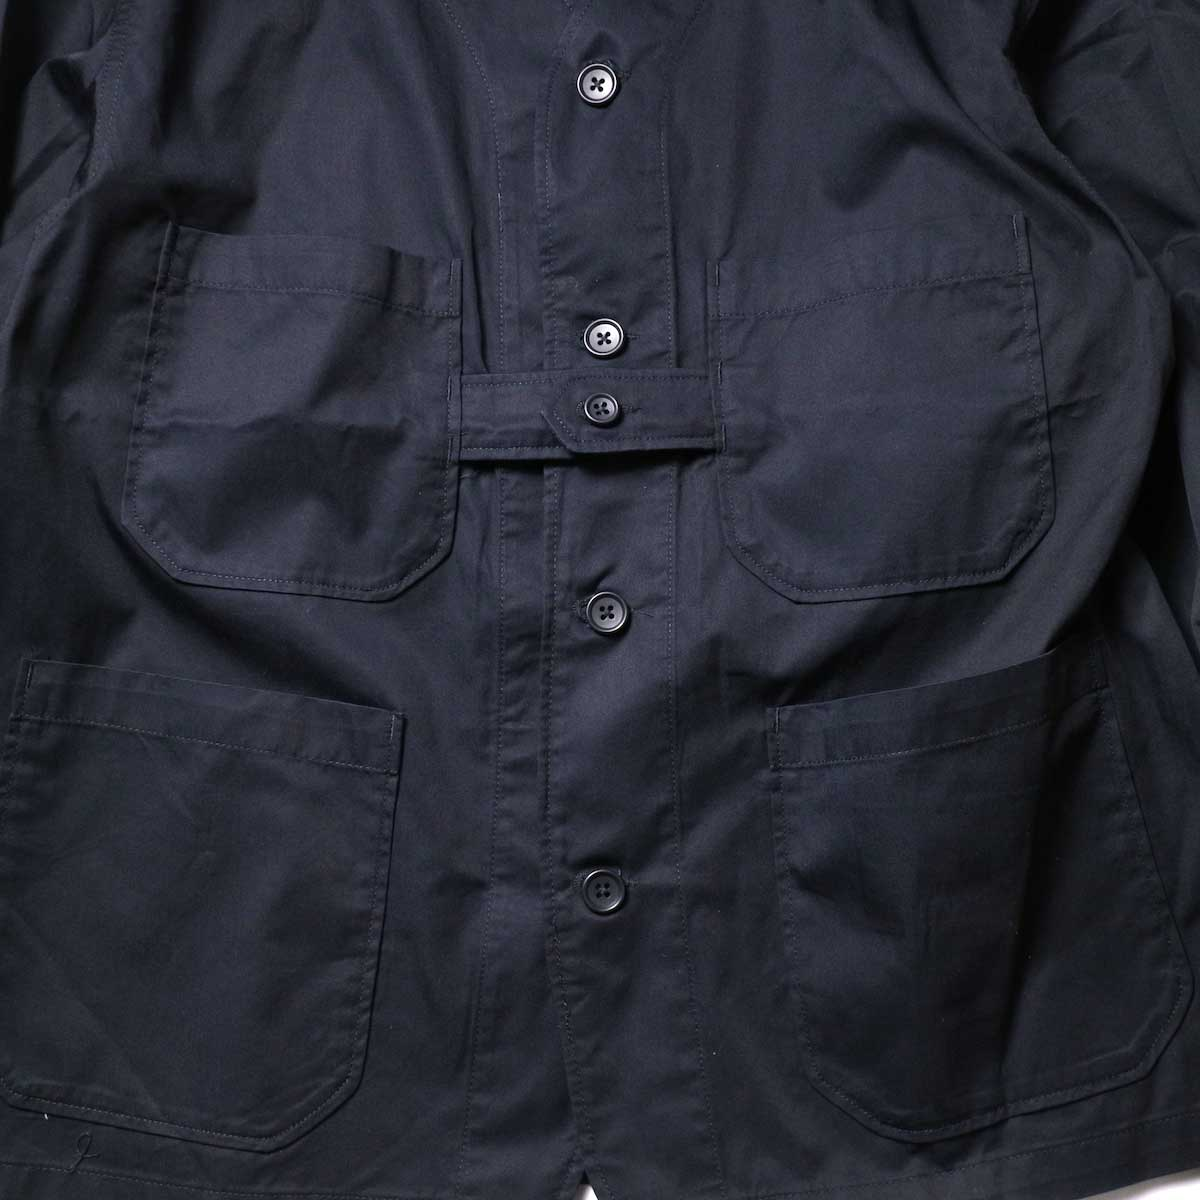 Engineered Garments / Cardigan Jacket -High Count Twill (Black)ポケット